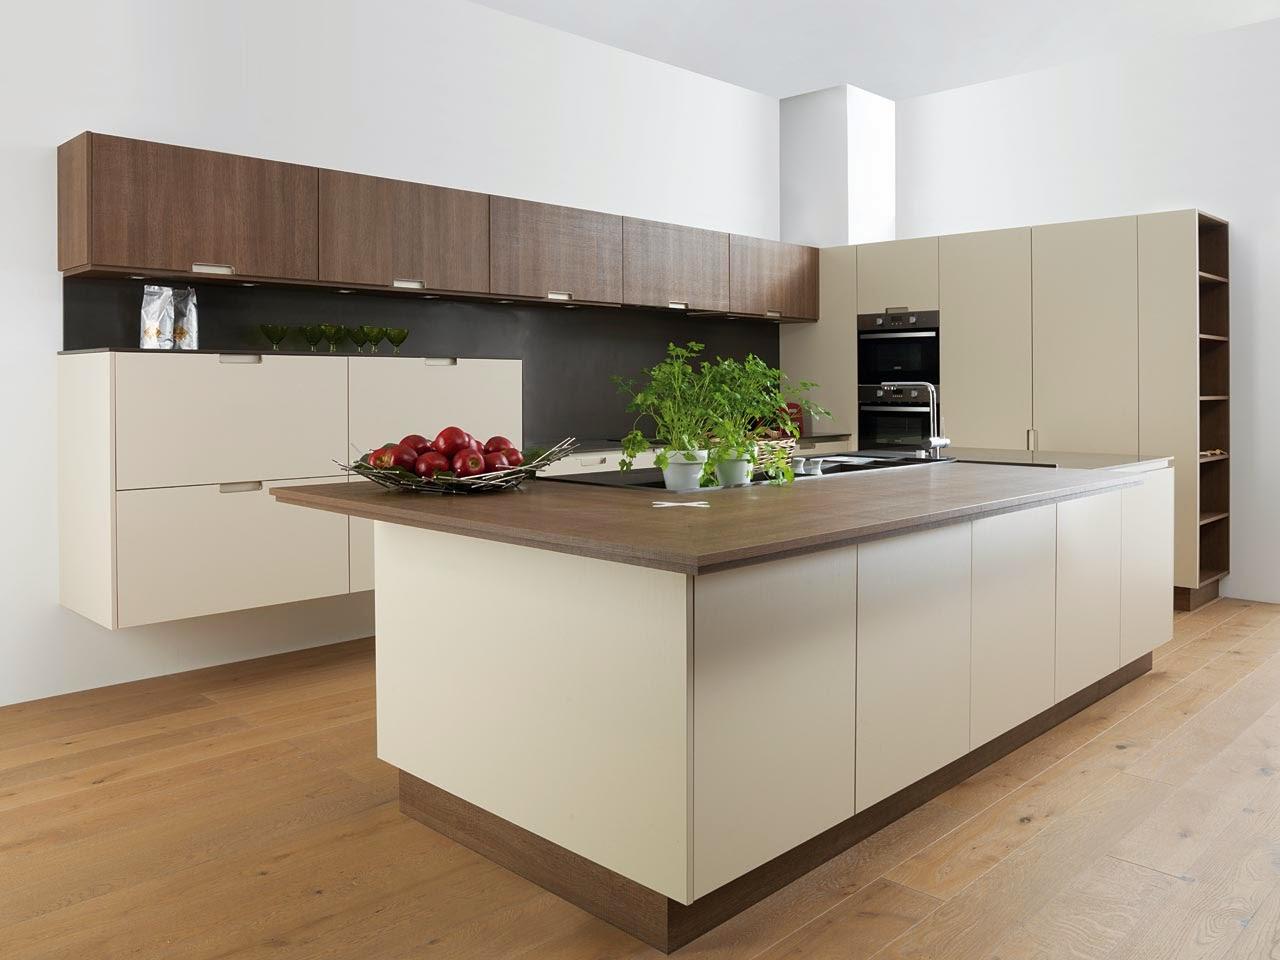 elite kitchen coimbatore